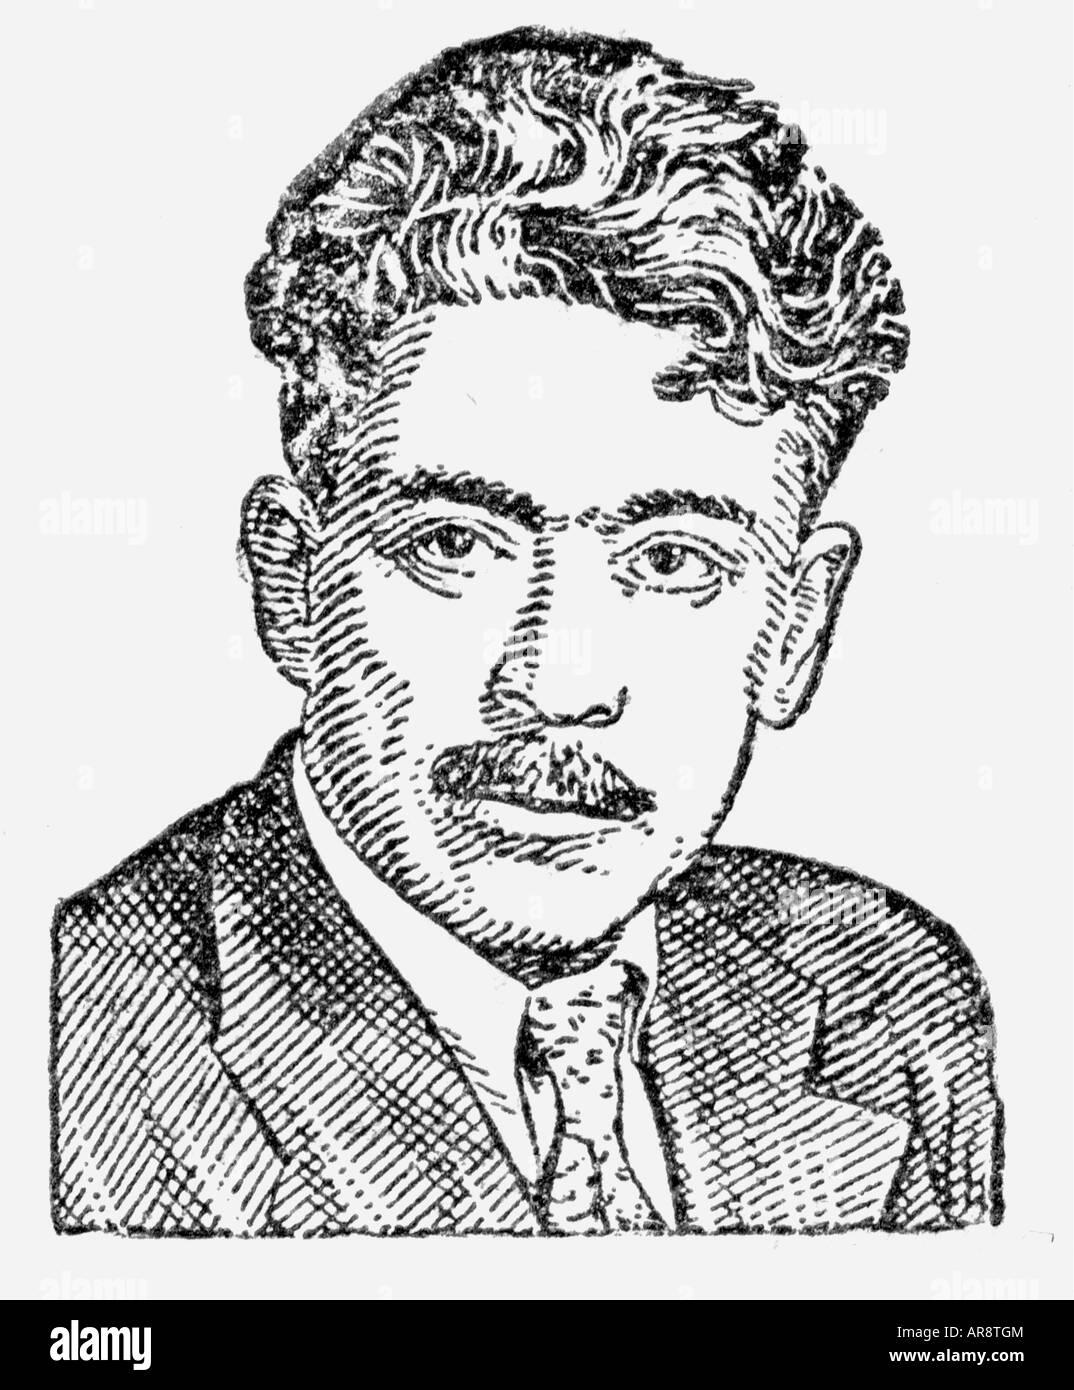 Wurgun, Samed, 1906 - 1956, Azerbaijani author / writer, portrait, anonymous drawing from a Soviet encyclopaedia, - Stock Image